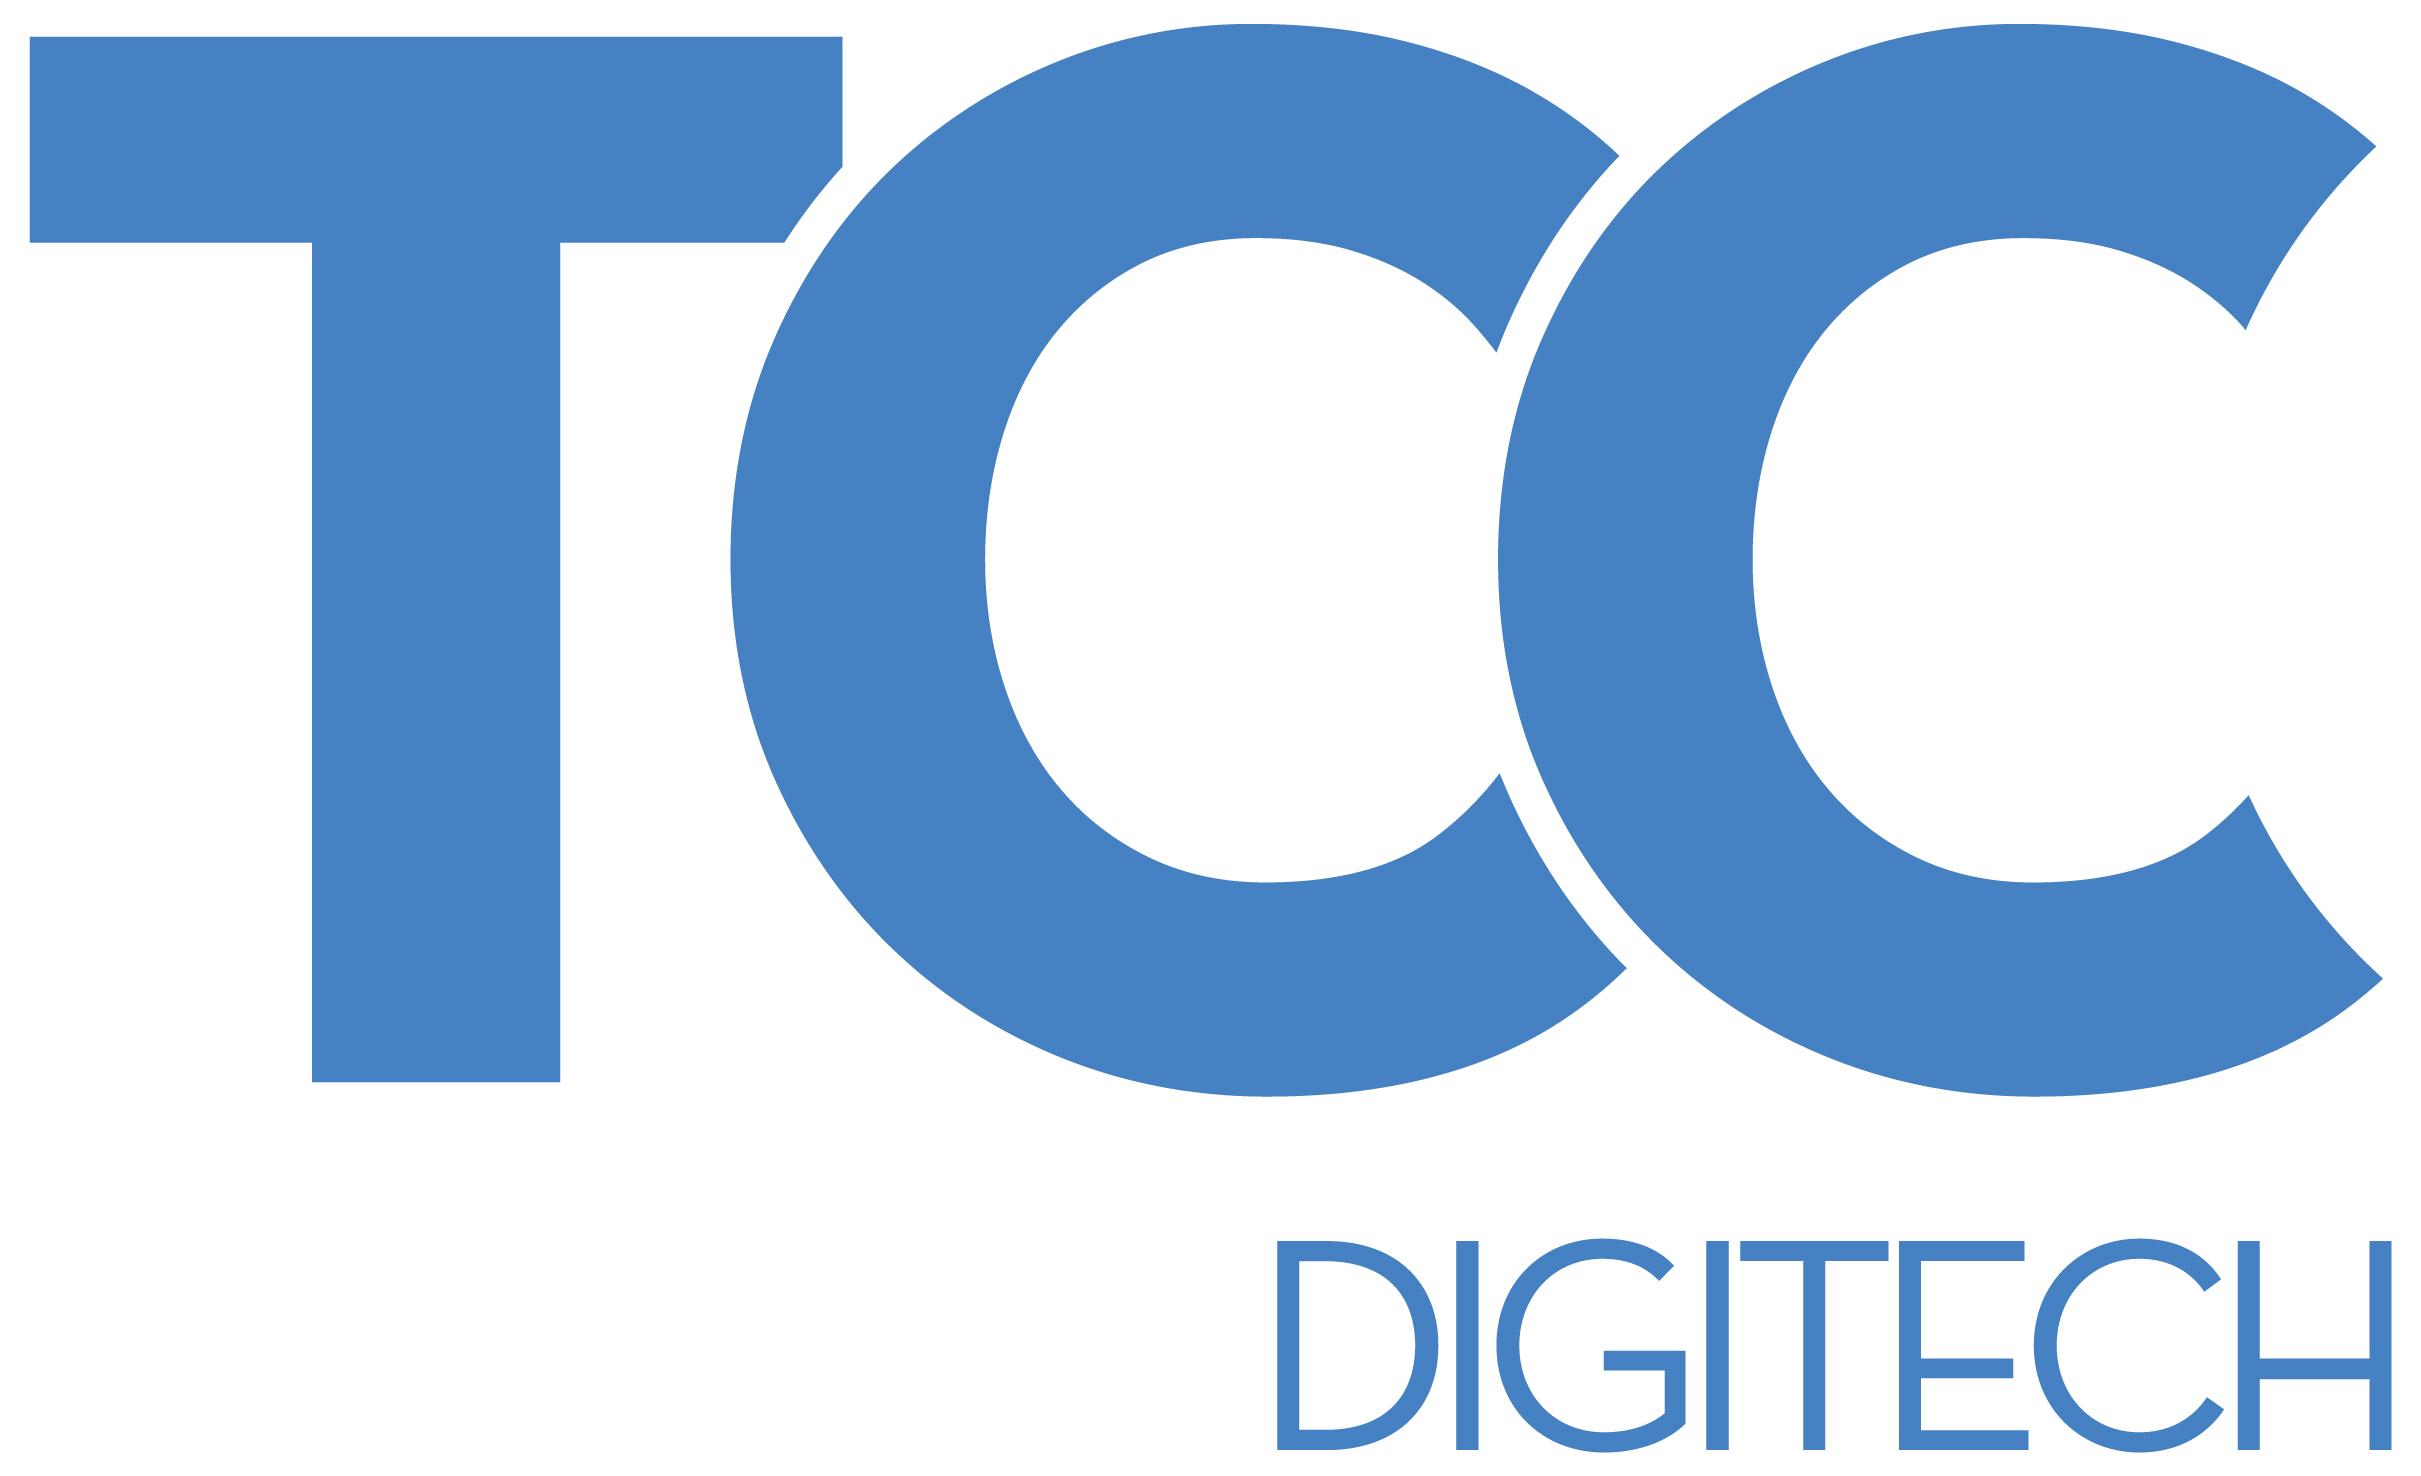 TCC Digitech - Best Digital Marketing Agency in Delhi ...